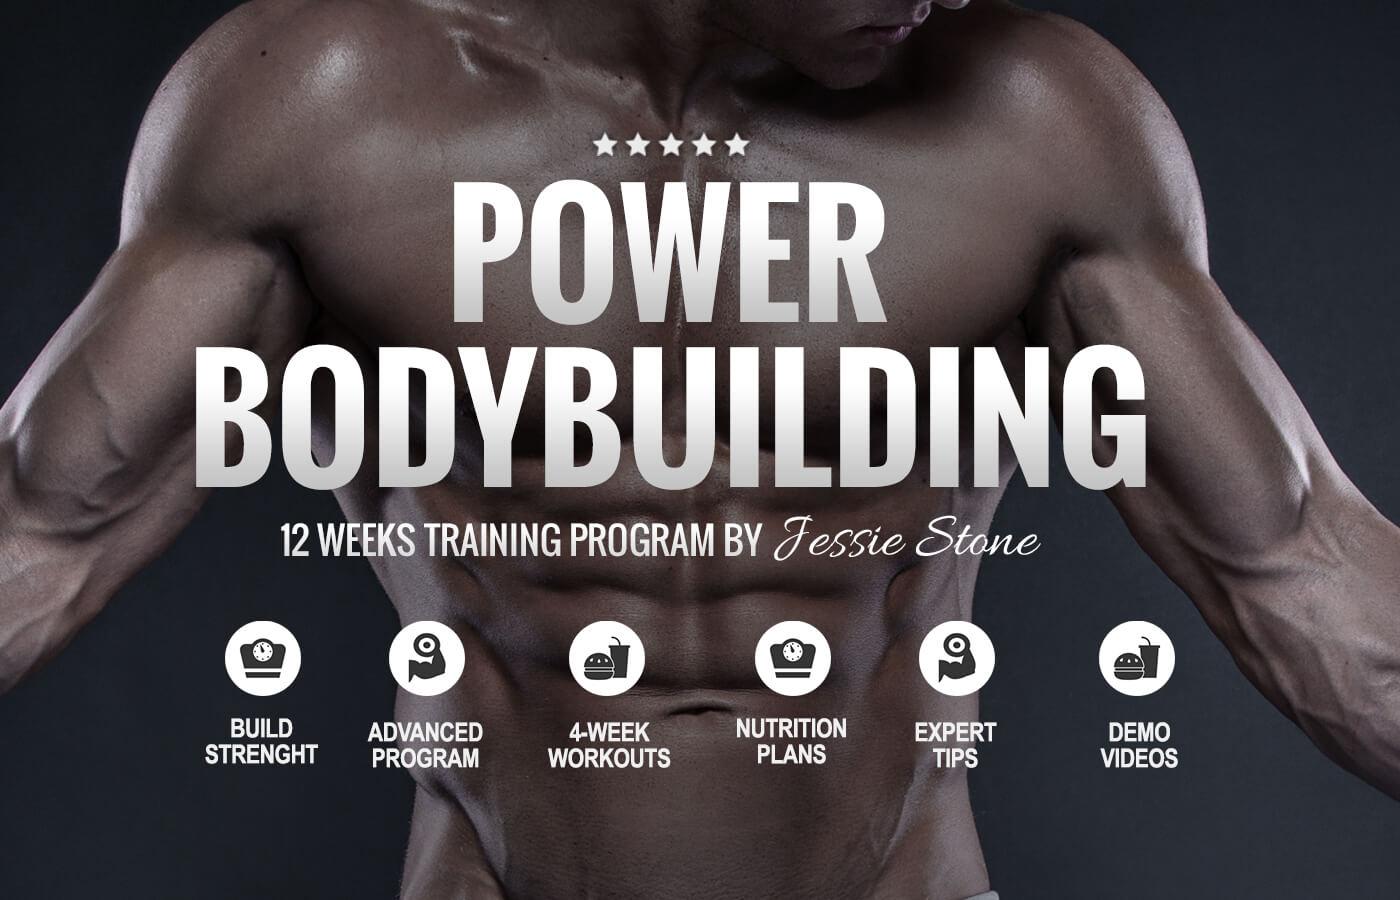 Power BodyBuilding